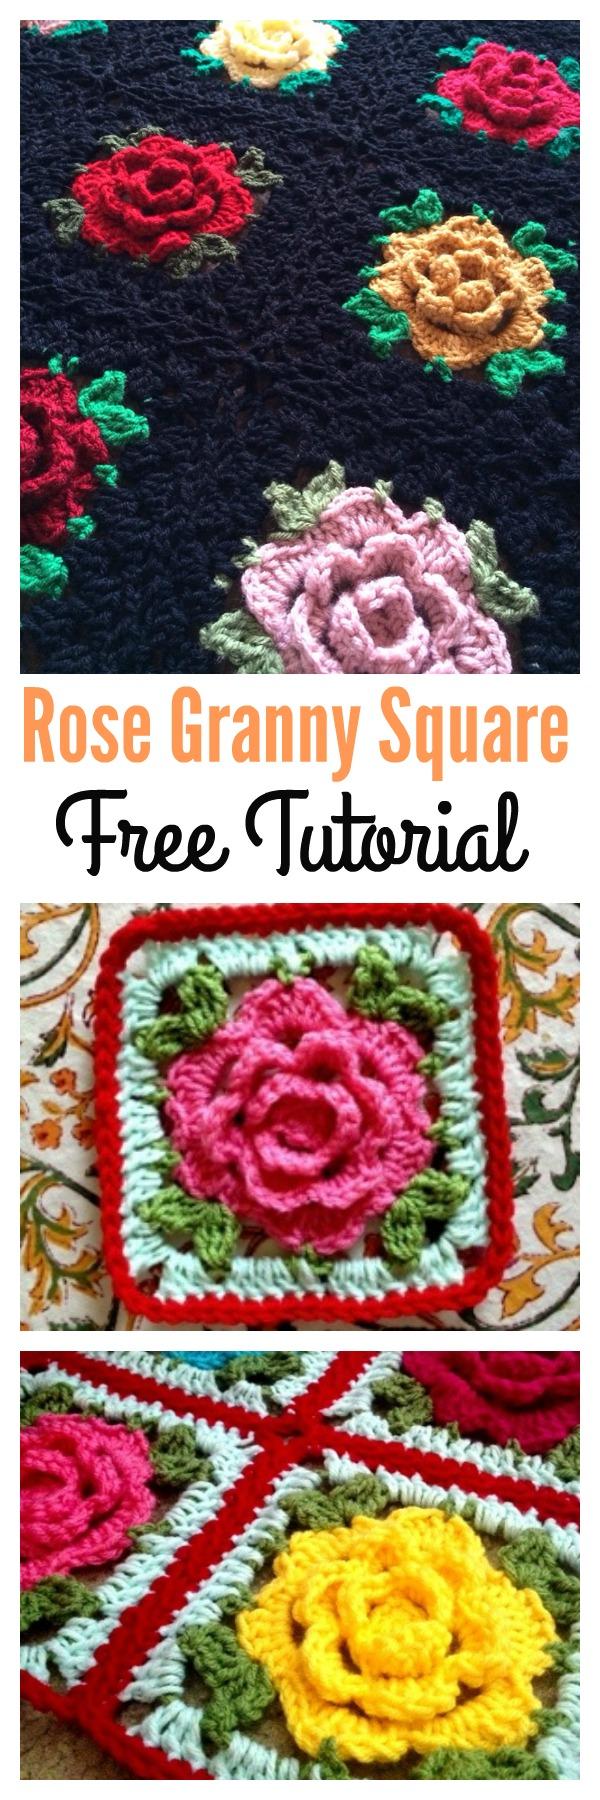 Crochet 3D Rose Granny Square Afghan Free Tutorial